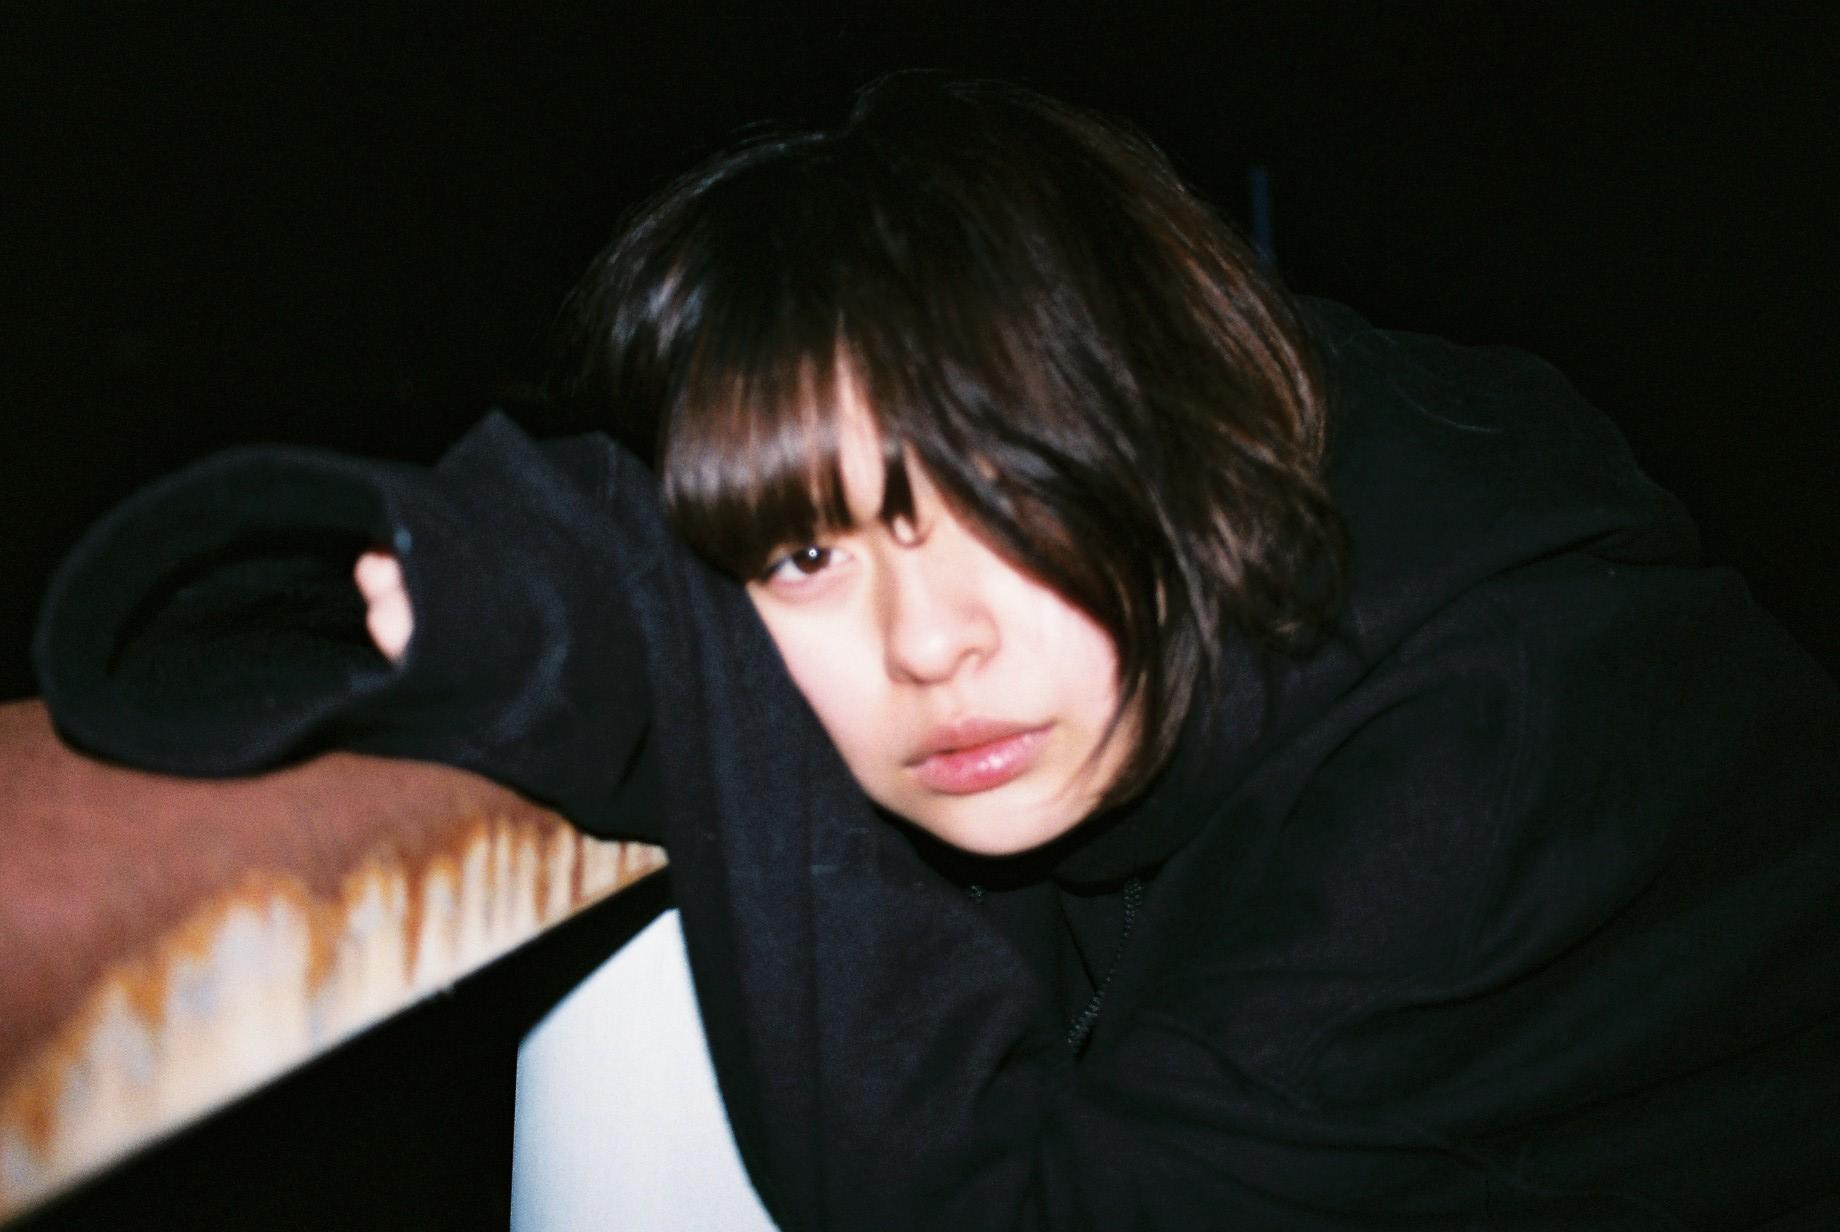 池田花梨 | Karin Ikeda